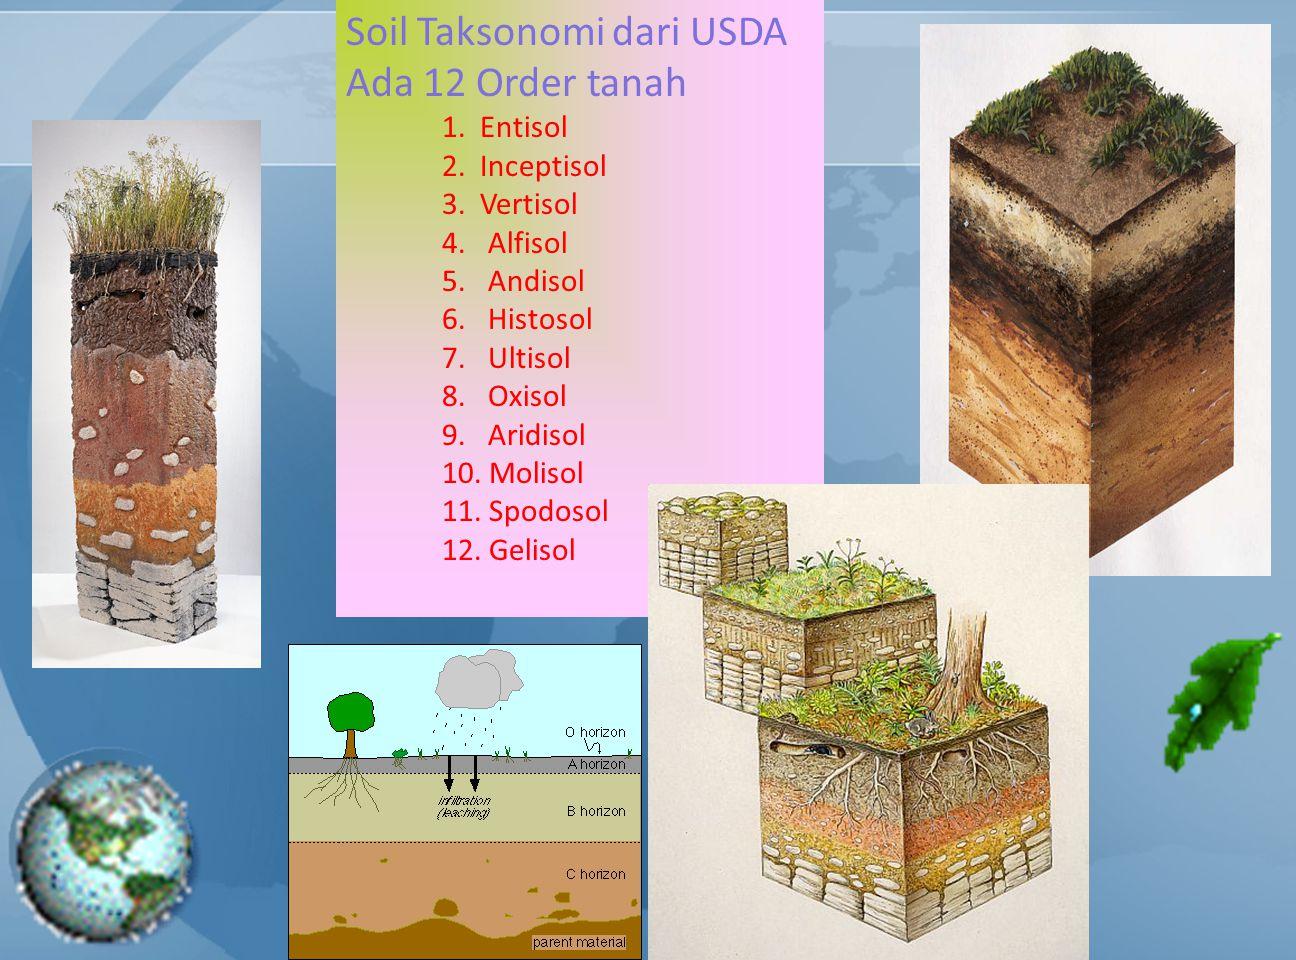 Soil Taksonomi dari USDA Ada 12 Order tanah 1. Entisol 2. Inceptisol 3. Vertisol 4. Alfisol 5. Andisol 6. Histosol 7. Ultisol 8. Oxisol 9. Aridisol 10